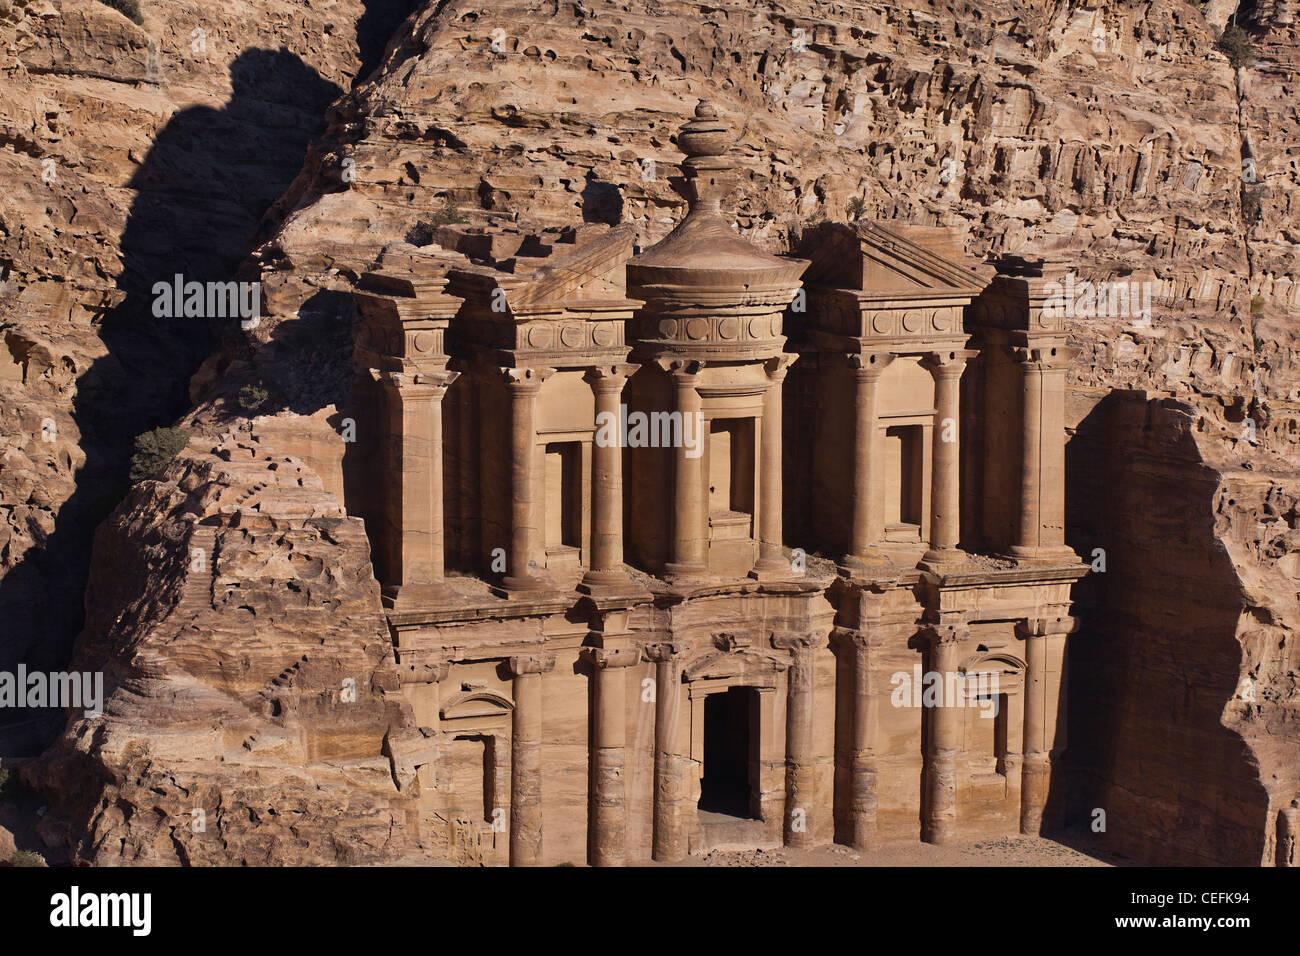 El Deir Monastery in Petra, Jordan. - Stock Image